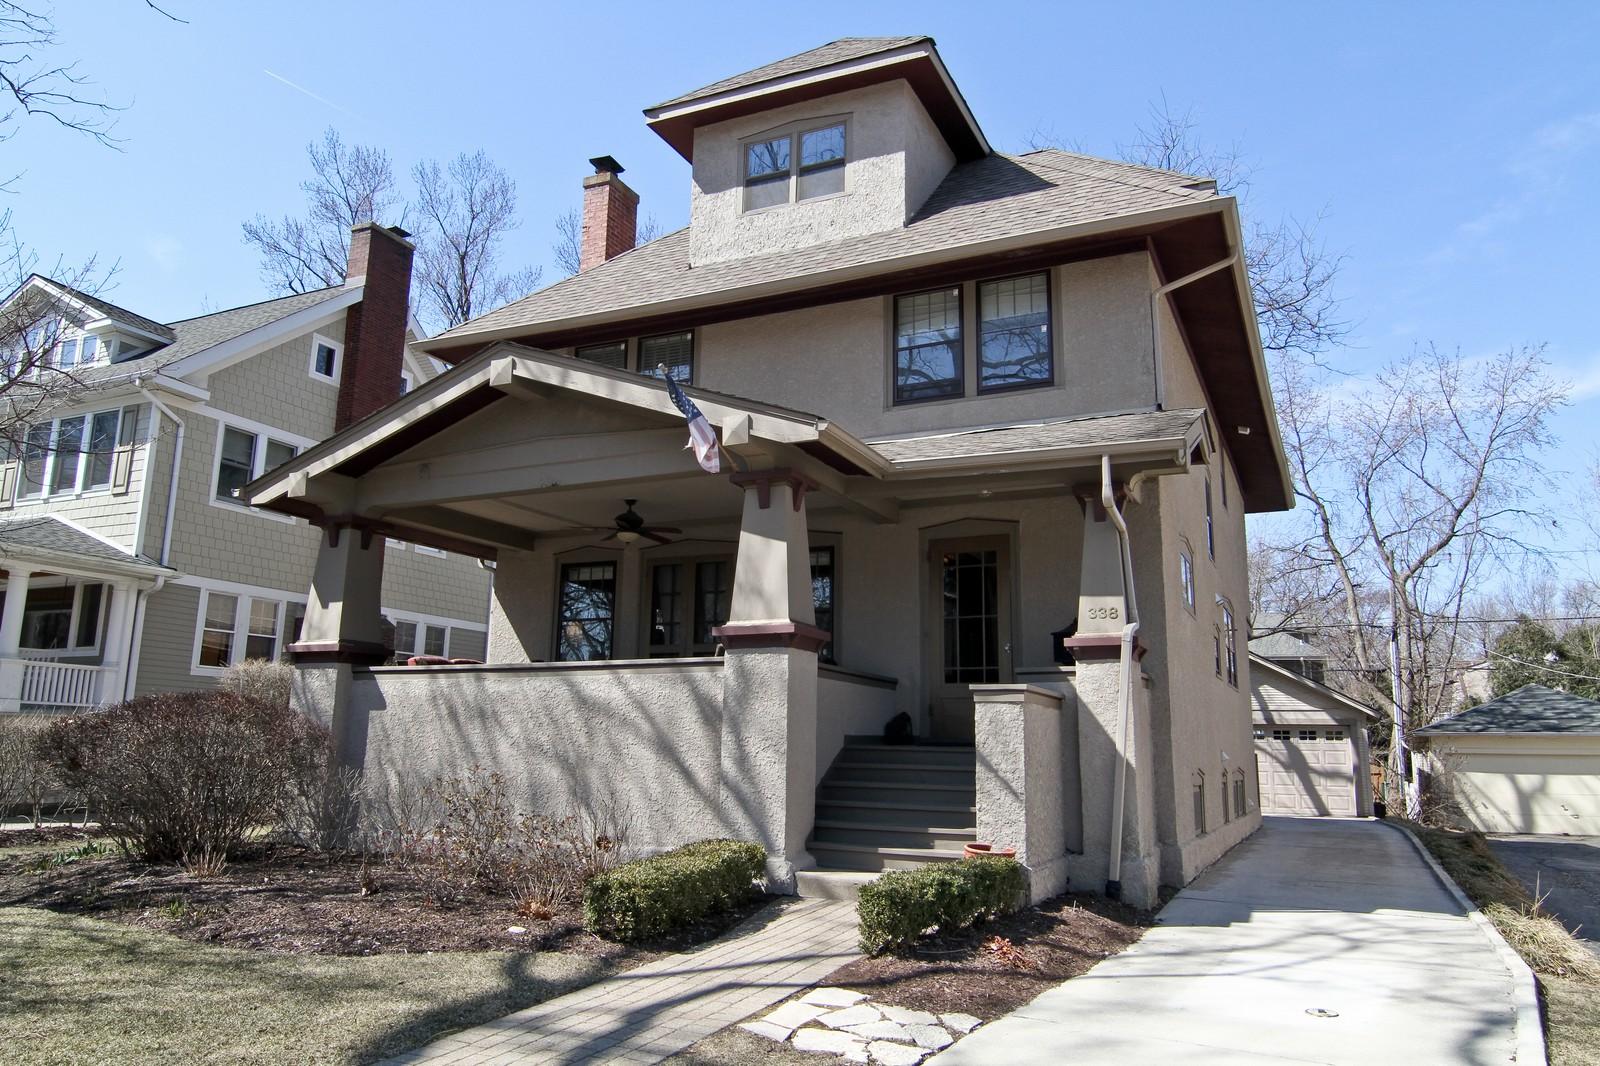 Real Estate Photography - 338 S. 8th, La Grange, IL, 60525 - Front View